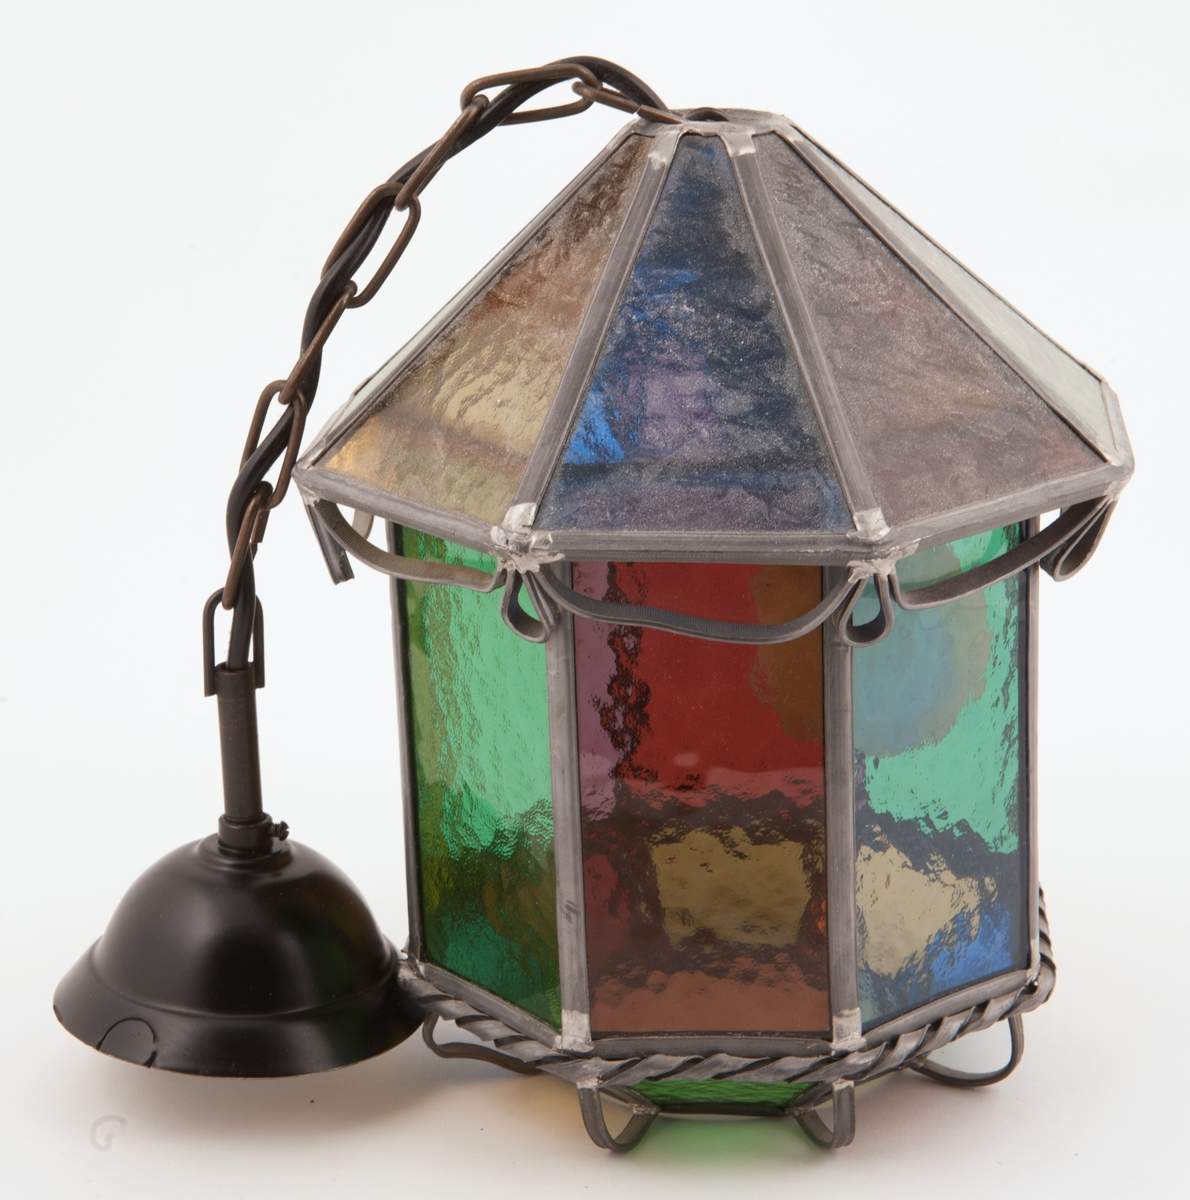 Bare ut Lampe - Norsk Folkemuseum / DigitaltMuseum CZ-23